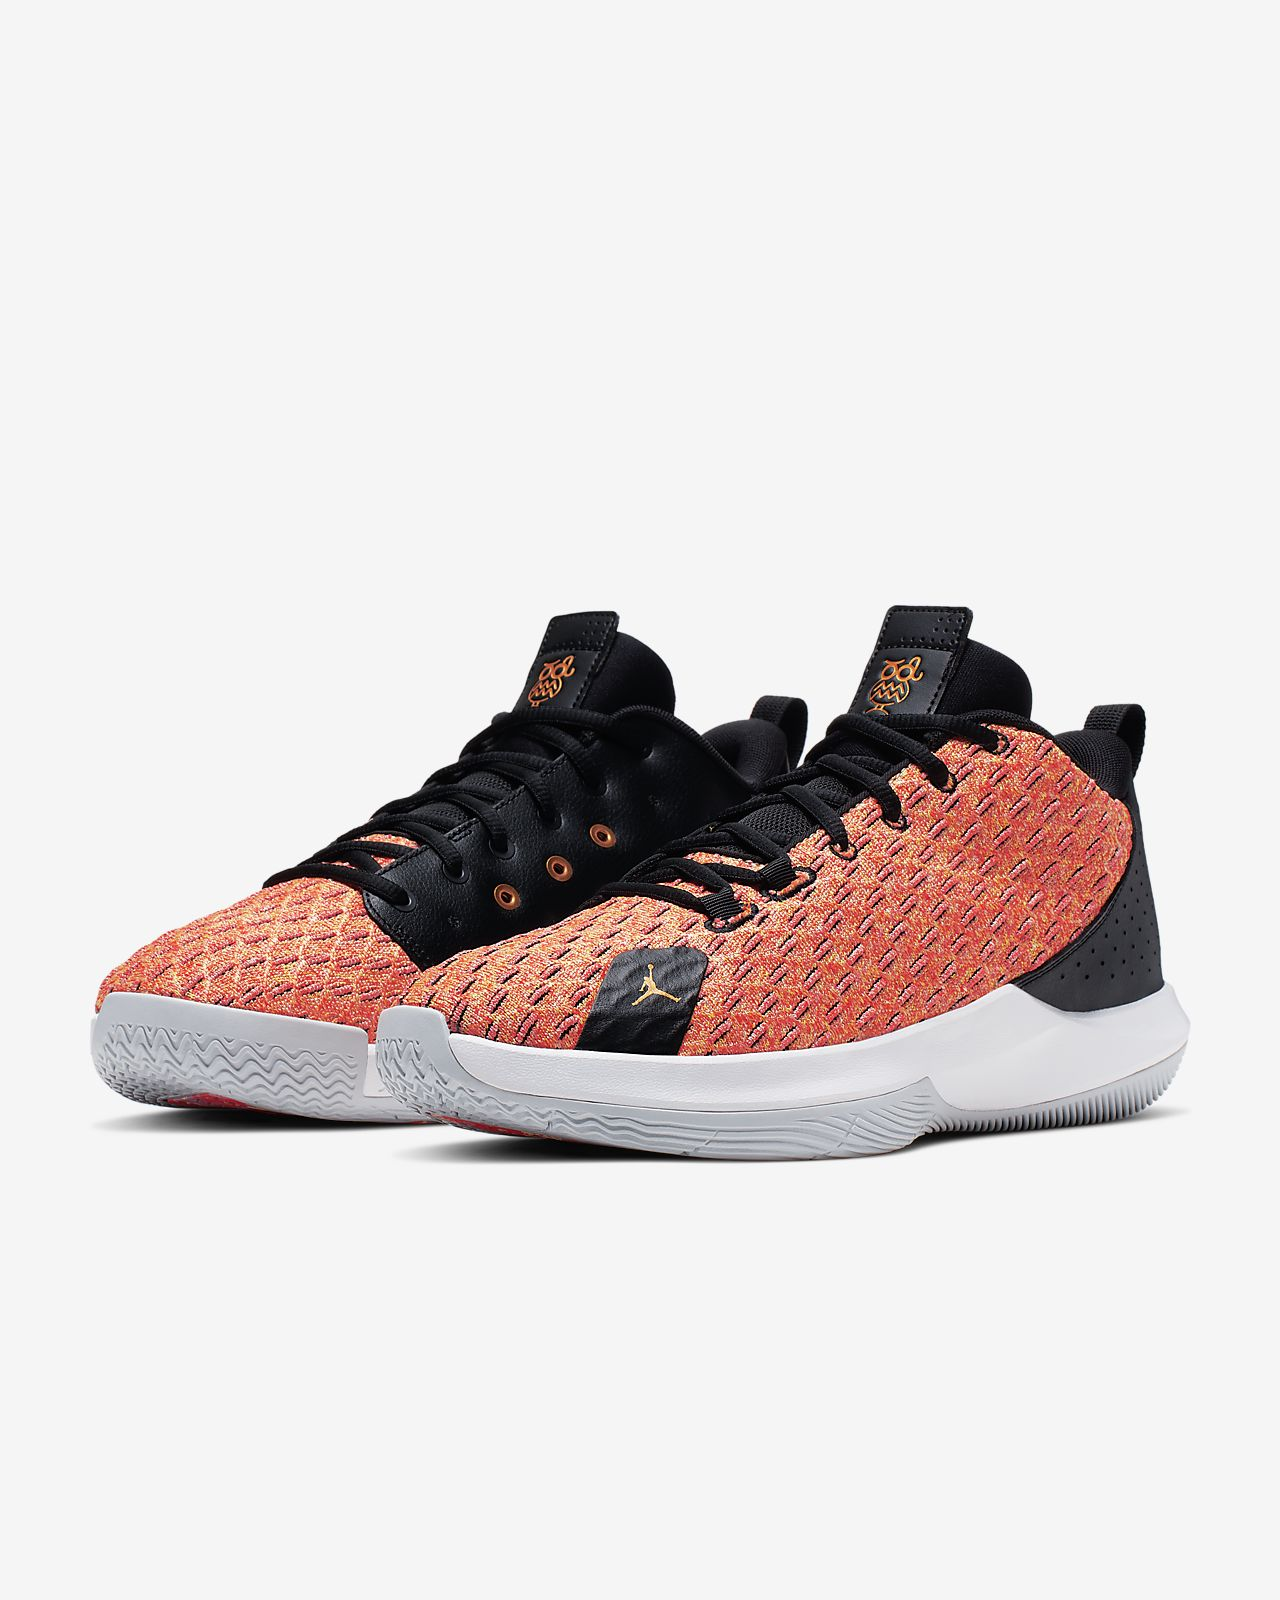 check out 54b22 8c562 XII Basketball Shoe Jordan CP3.XII Basketball Shoe